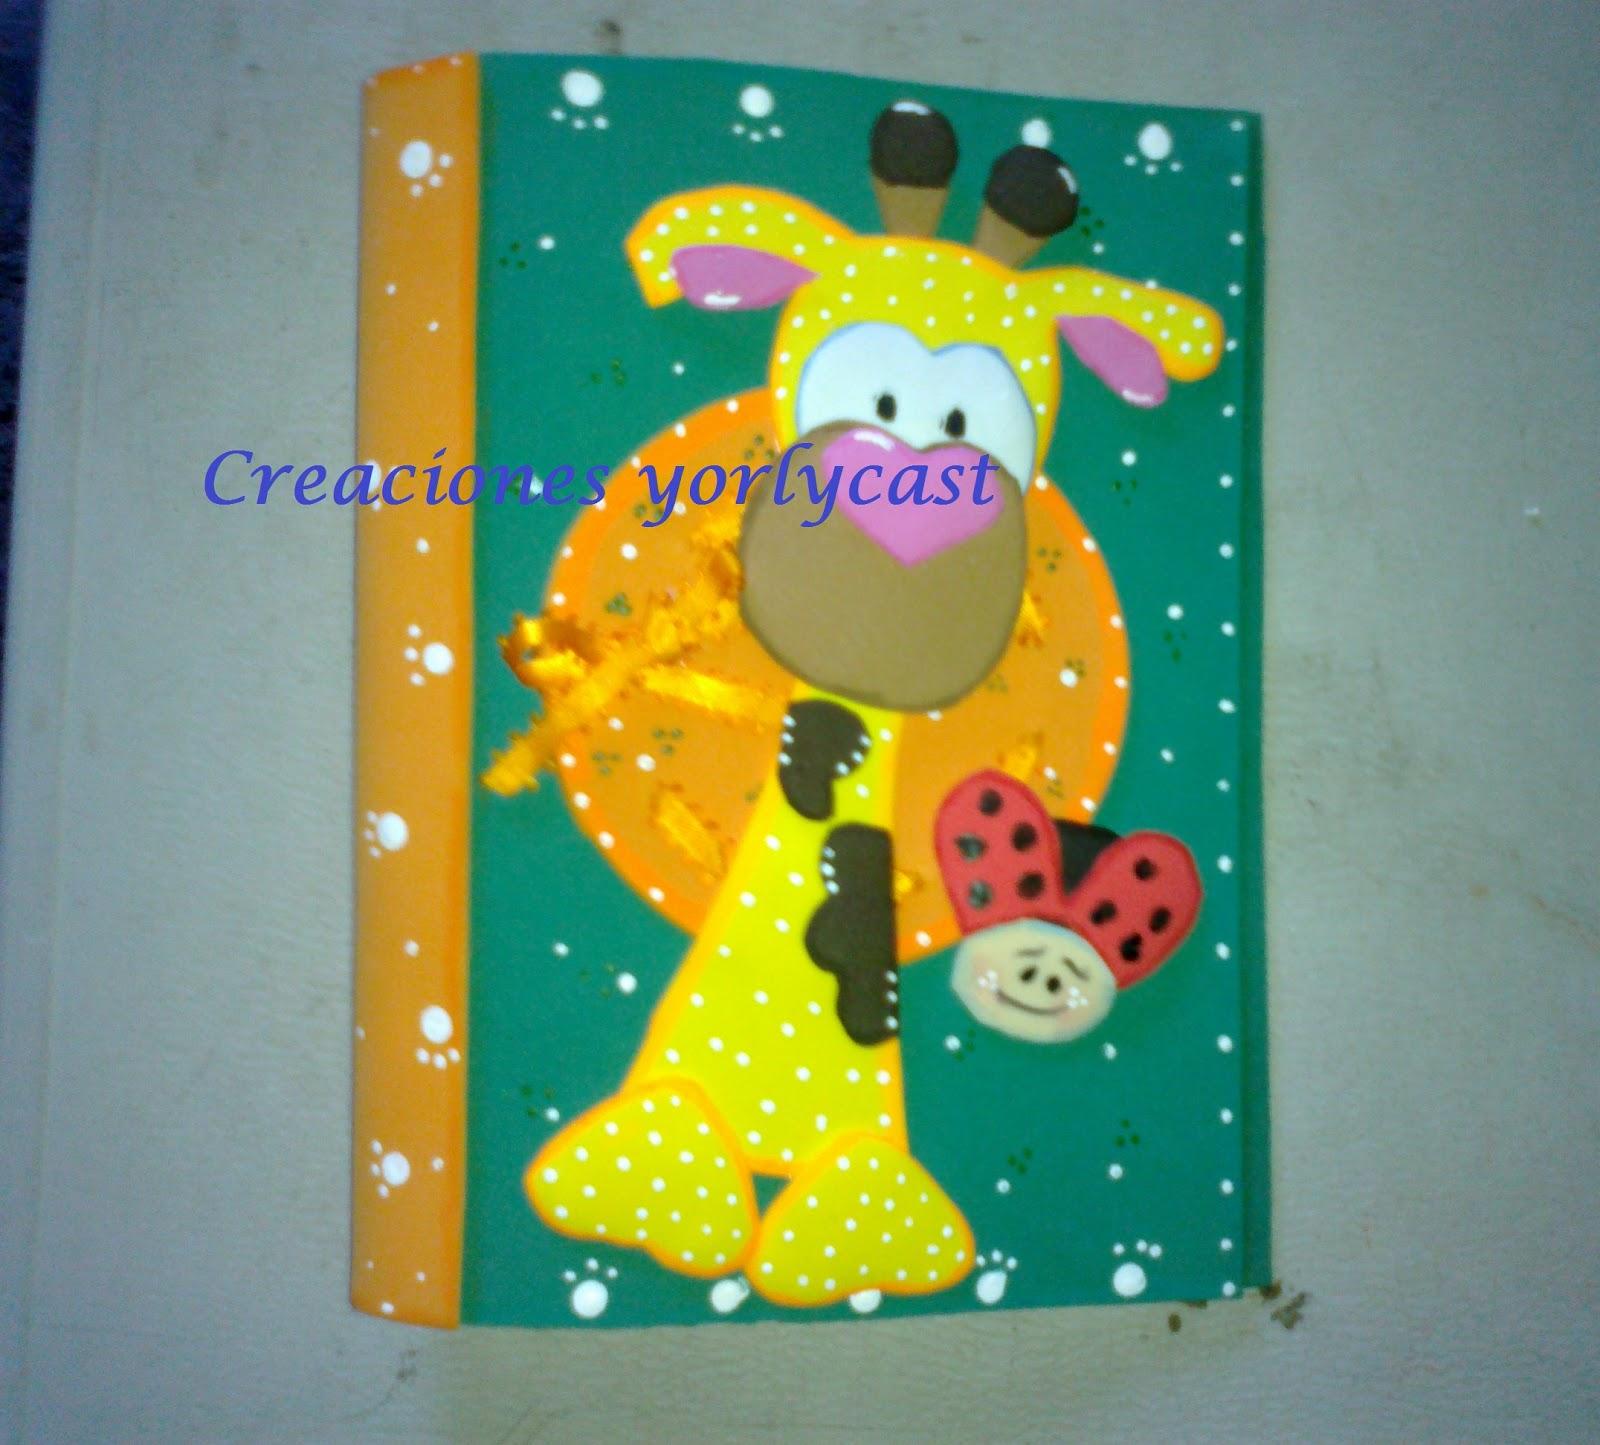 Pin Cuadernos Forrados Foami Wallpapers Real Madrid Serbagunamarine on